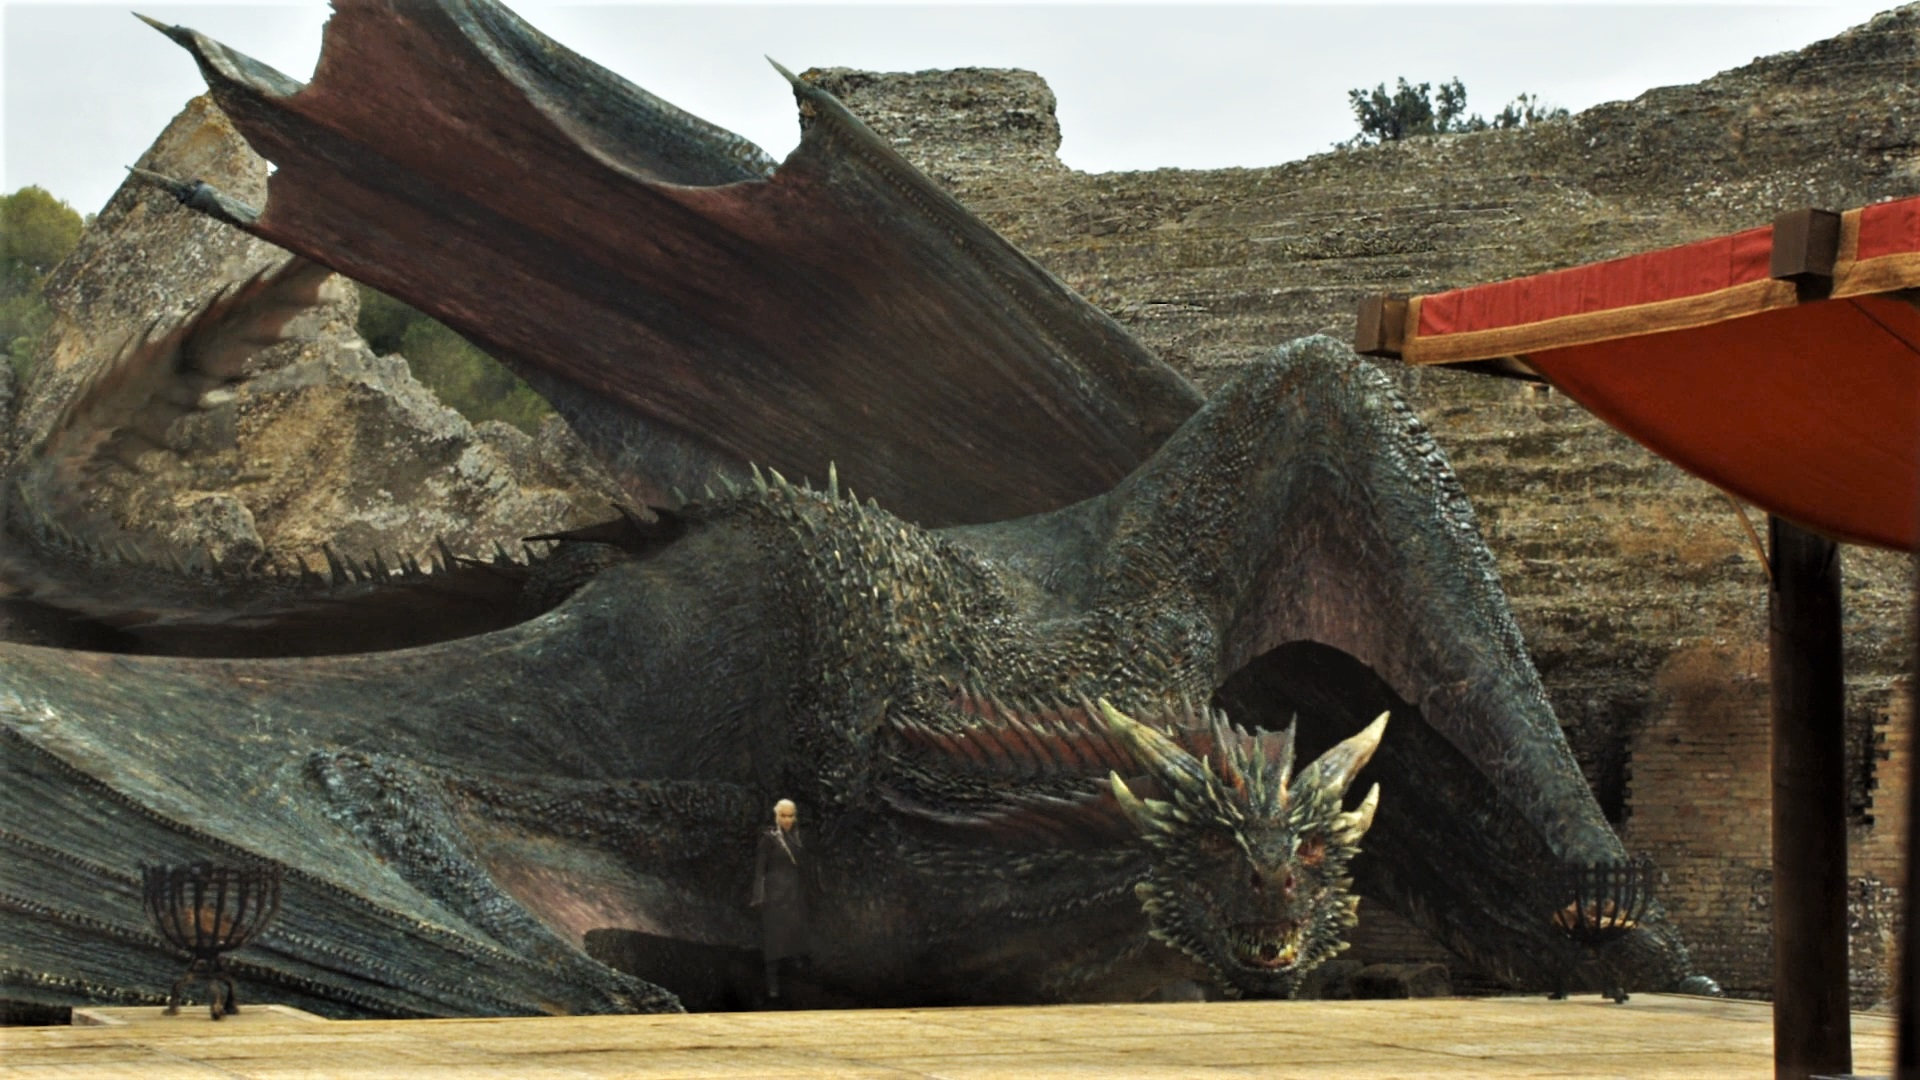 Will one of the last dragons return to this Targaryen ruin in season eight?